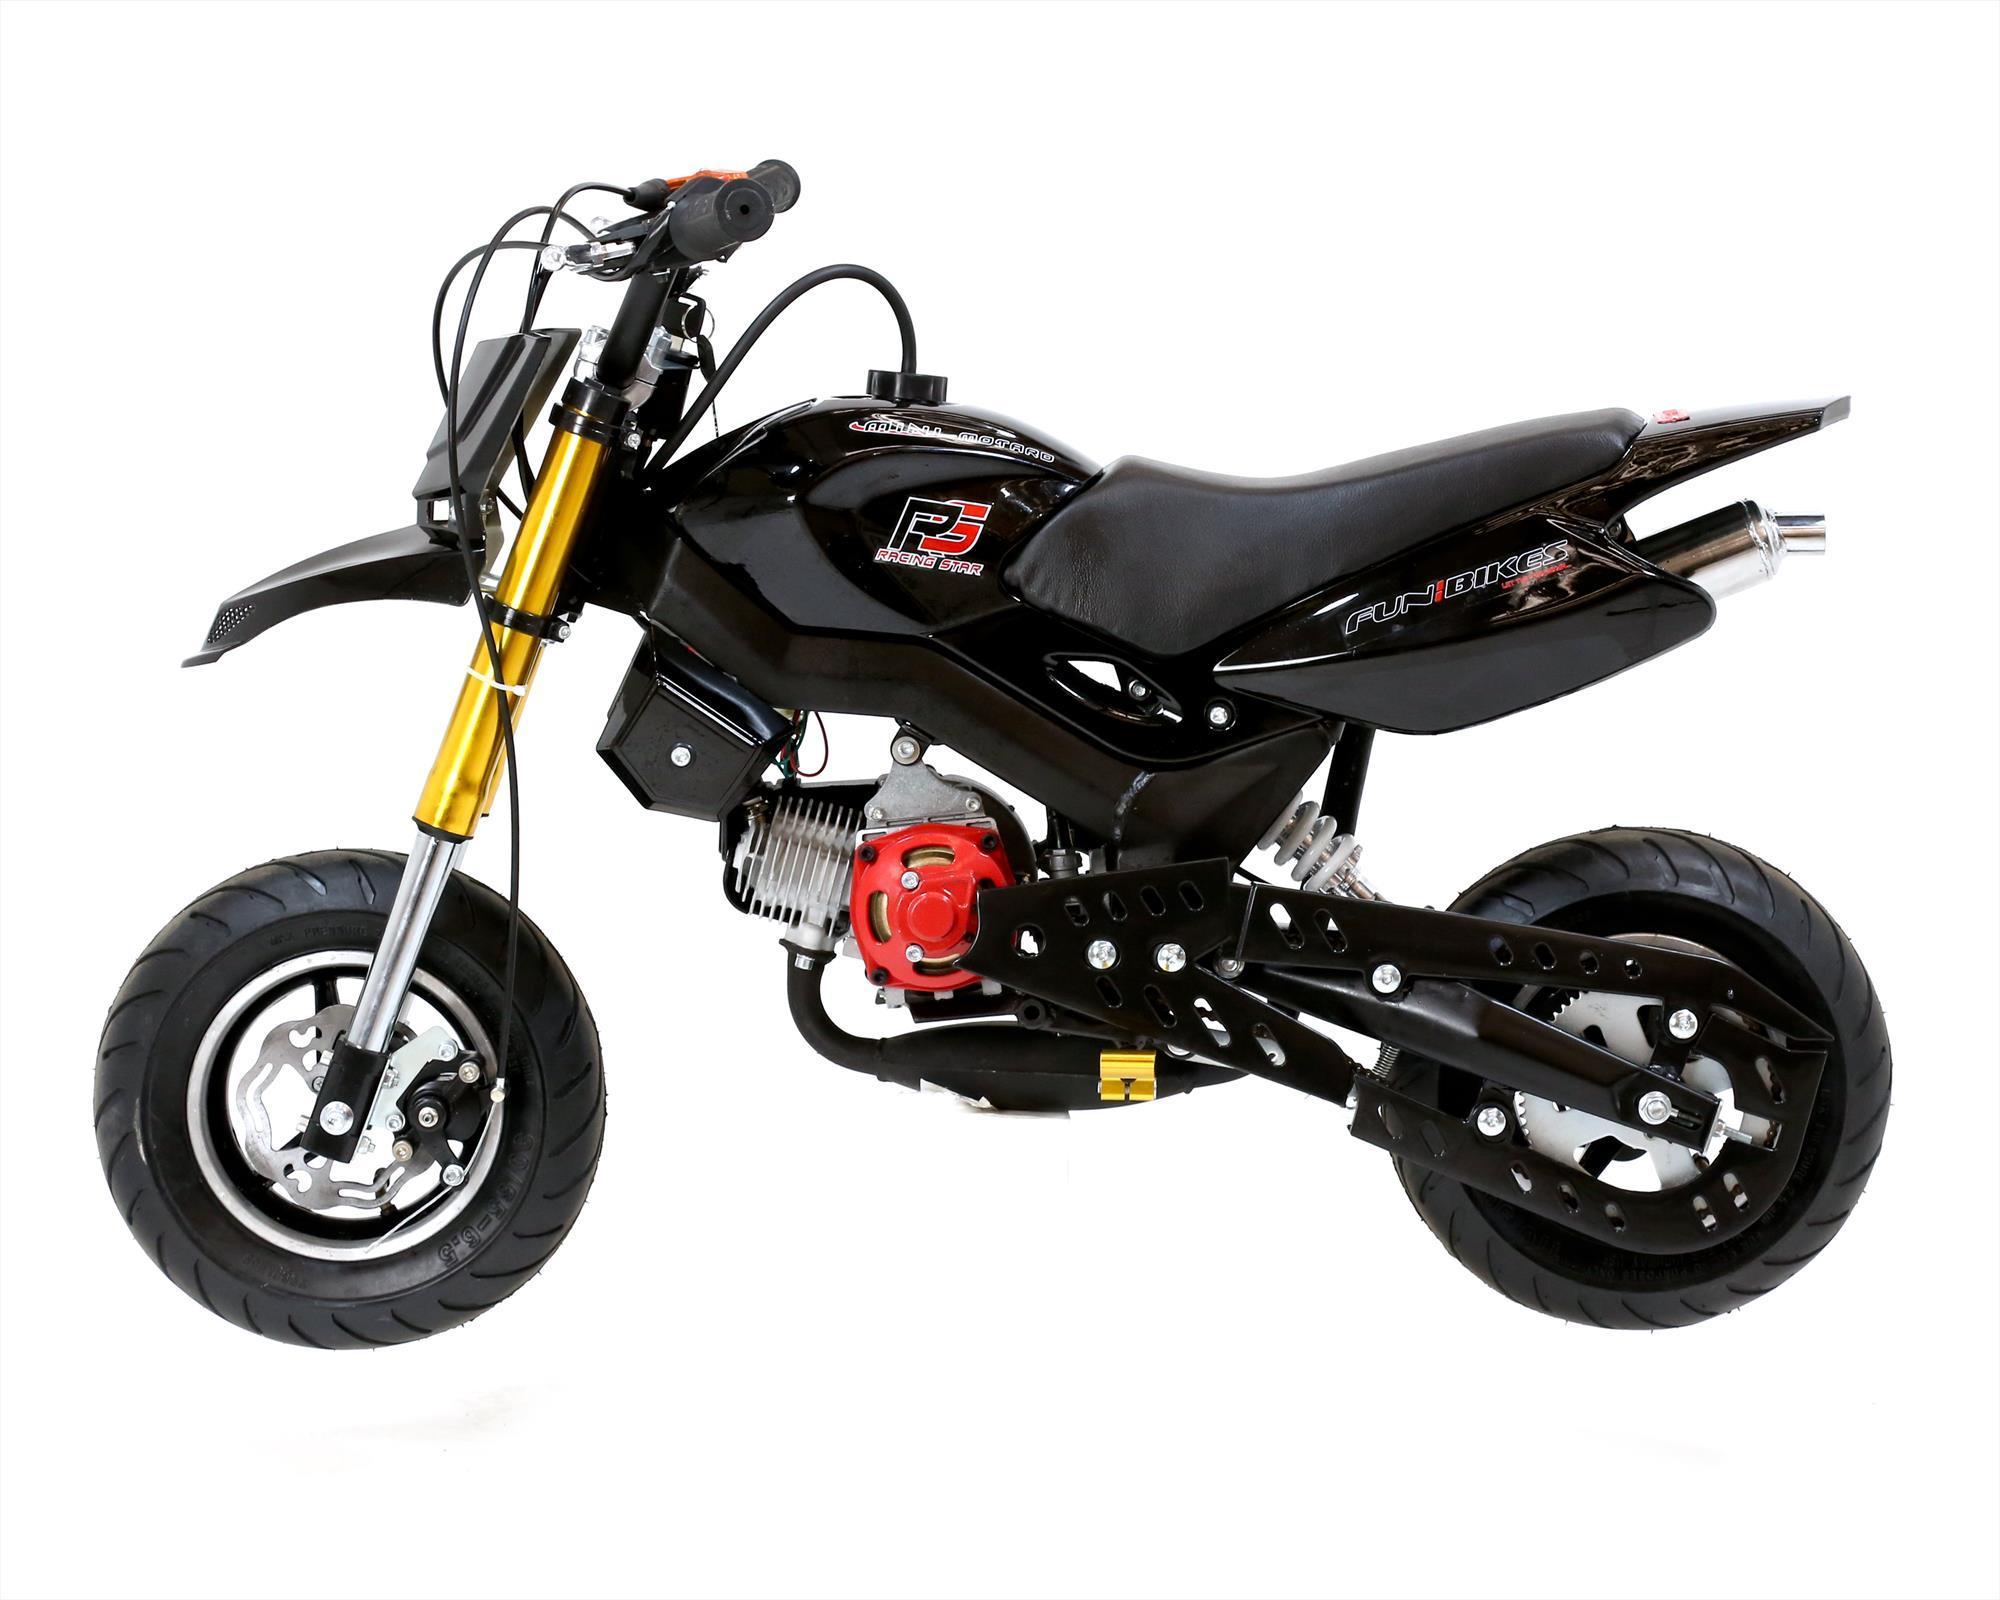 funbikes super motard 50cc 48cm petrol black mini moto bike. Black Bedroom Furniture Sets. Home Design Ideas